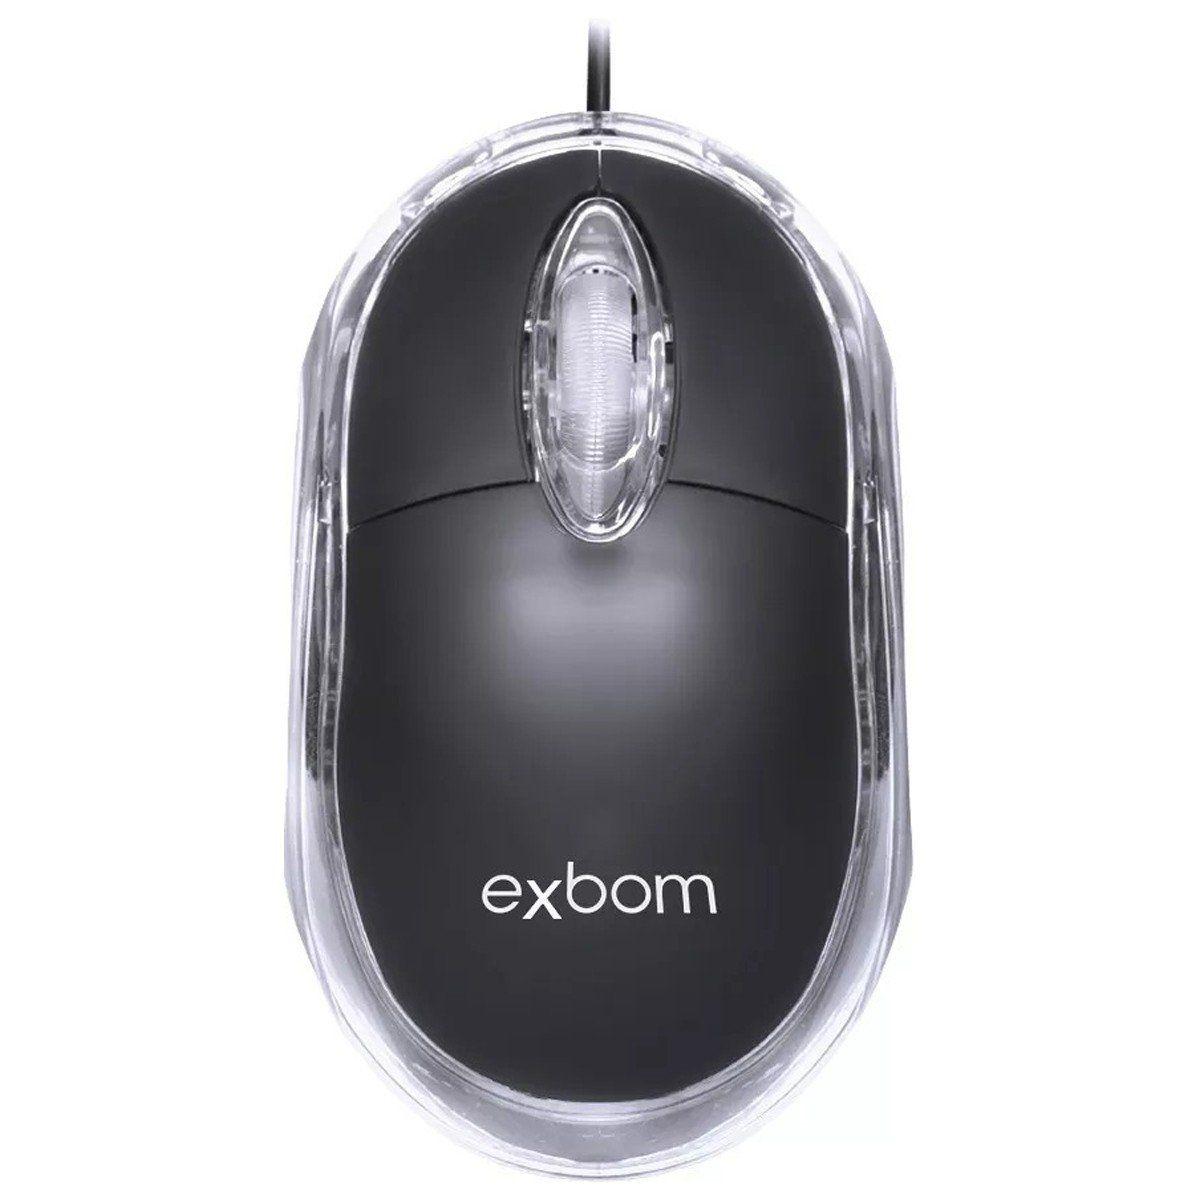 MOUSE ÓTICO USB 1000 DPI C/ LED AZUL EXBOM MS-10